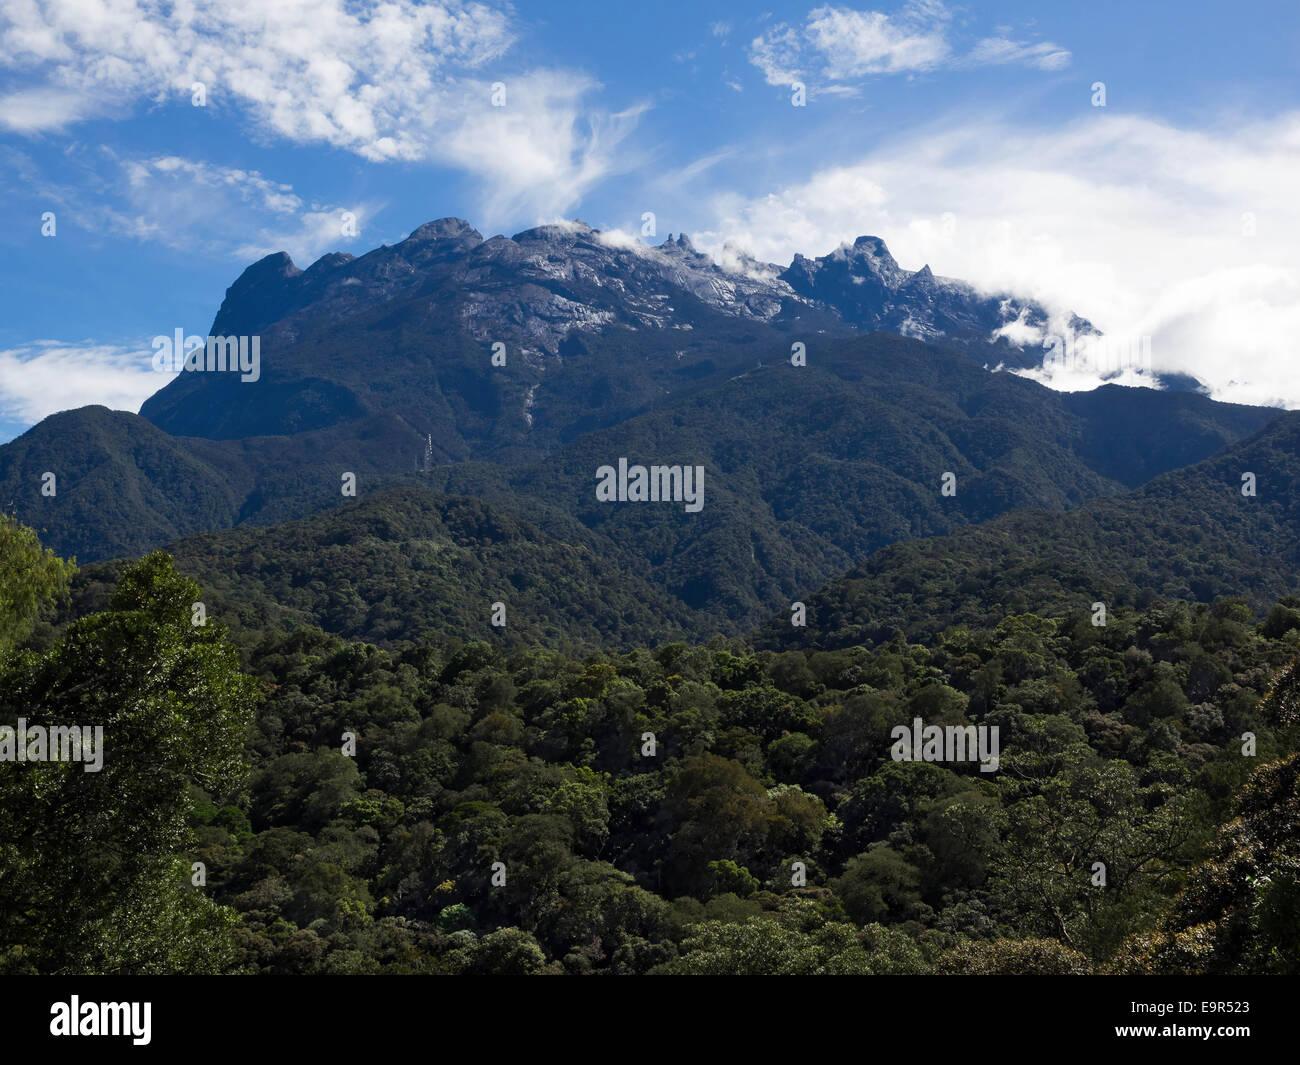 Mount Kinabalu, the highest peak in the Malay Archipelago, Sabah, East Malaysia. - Stock Image